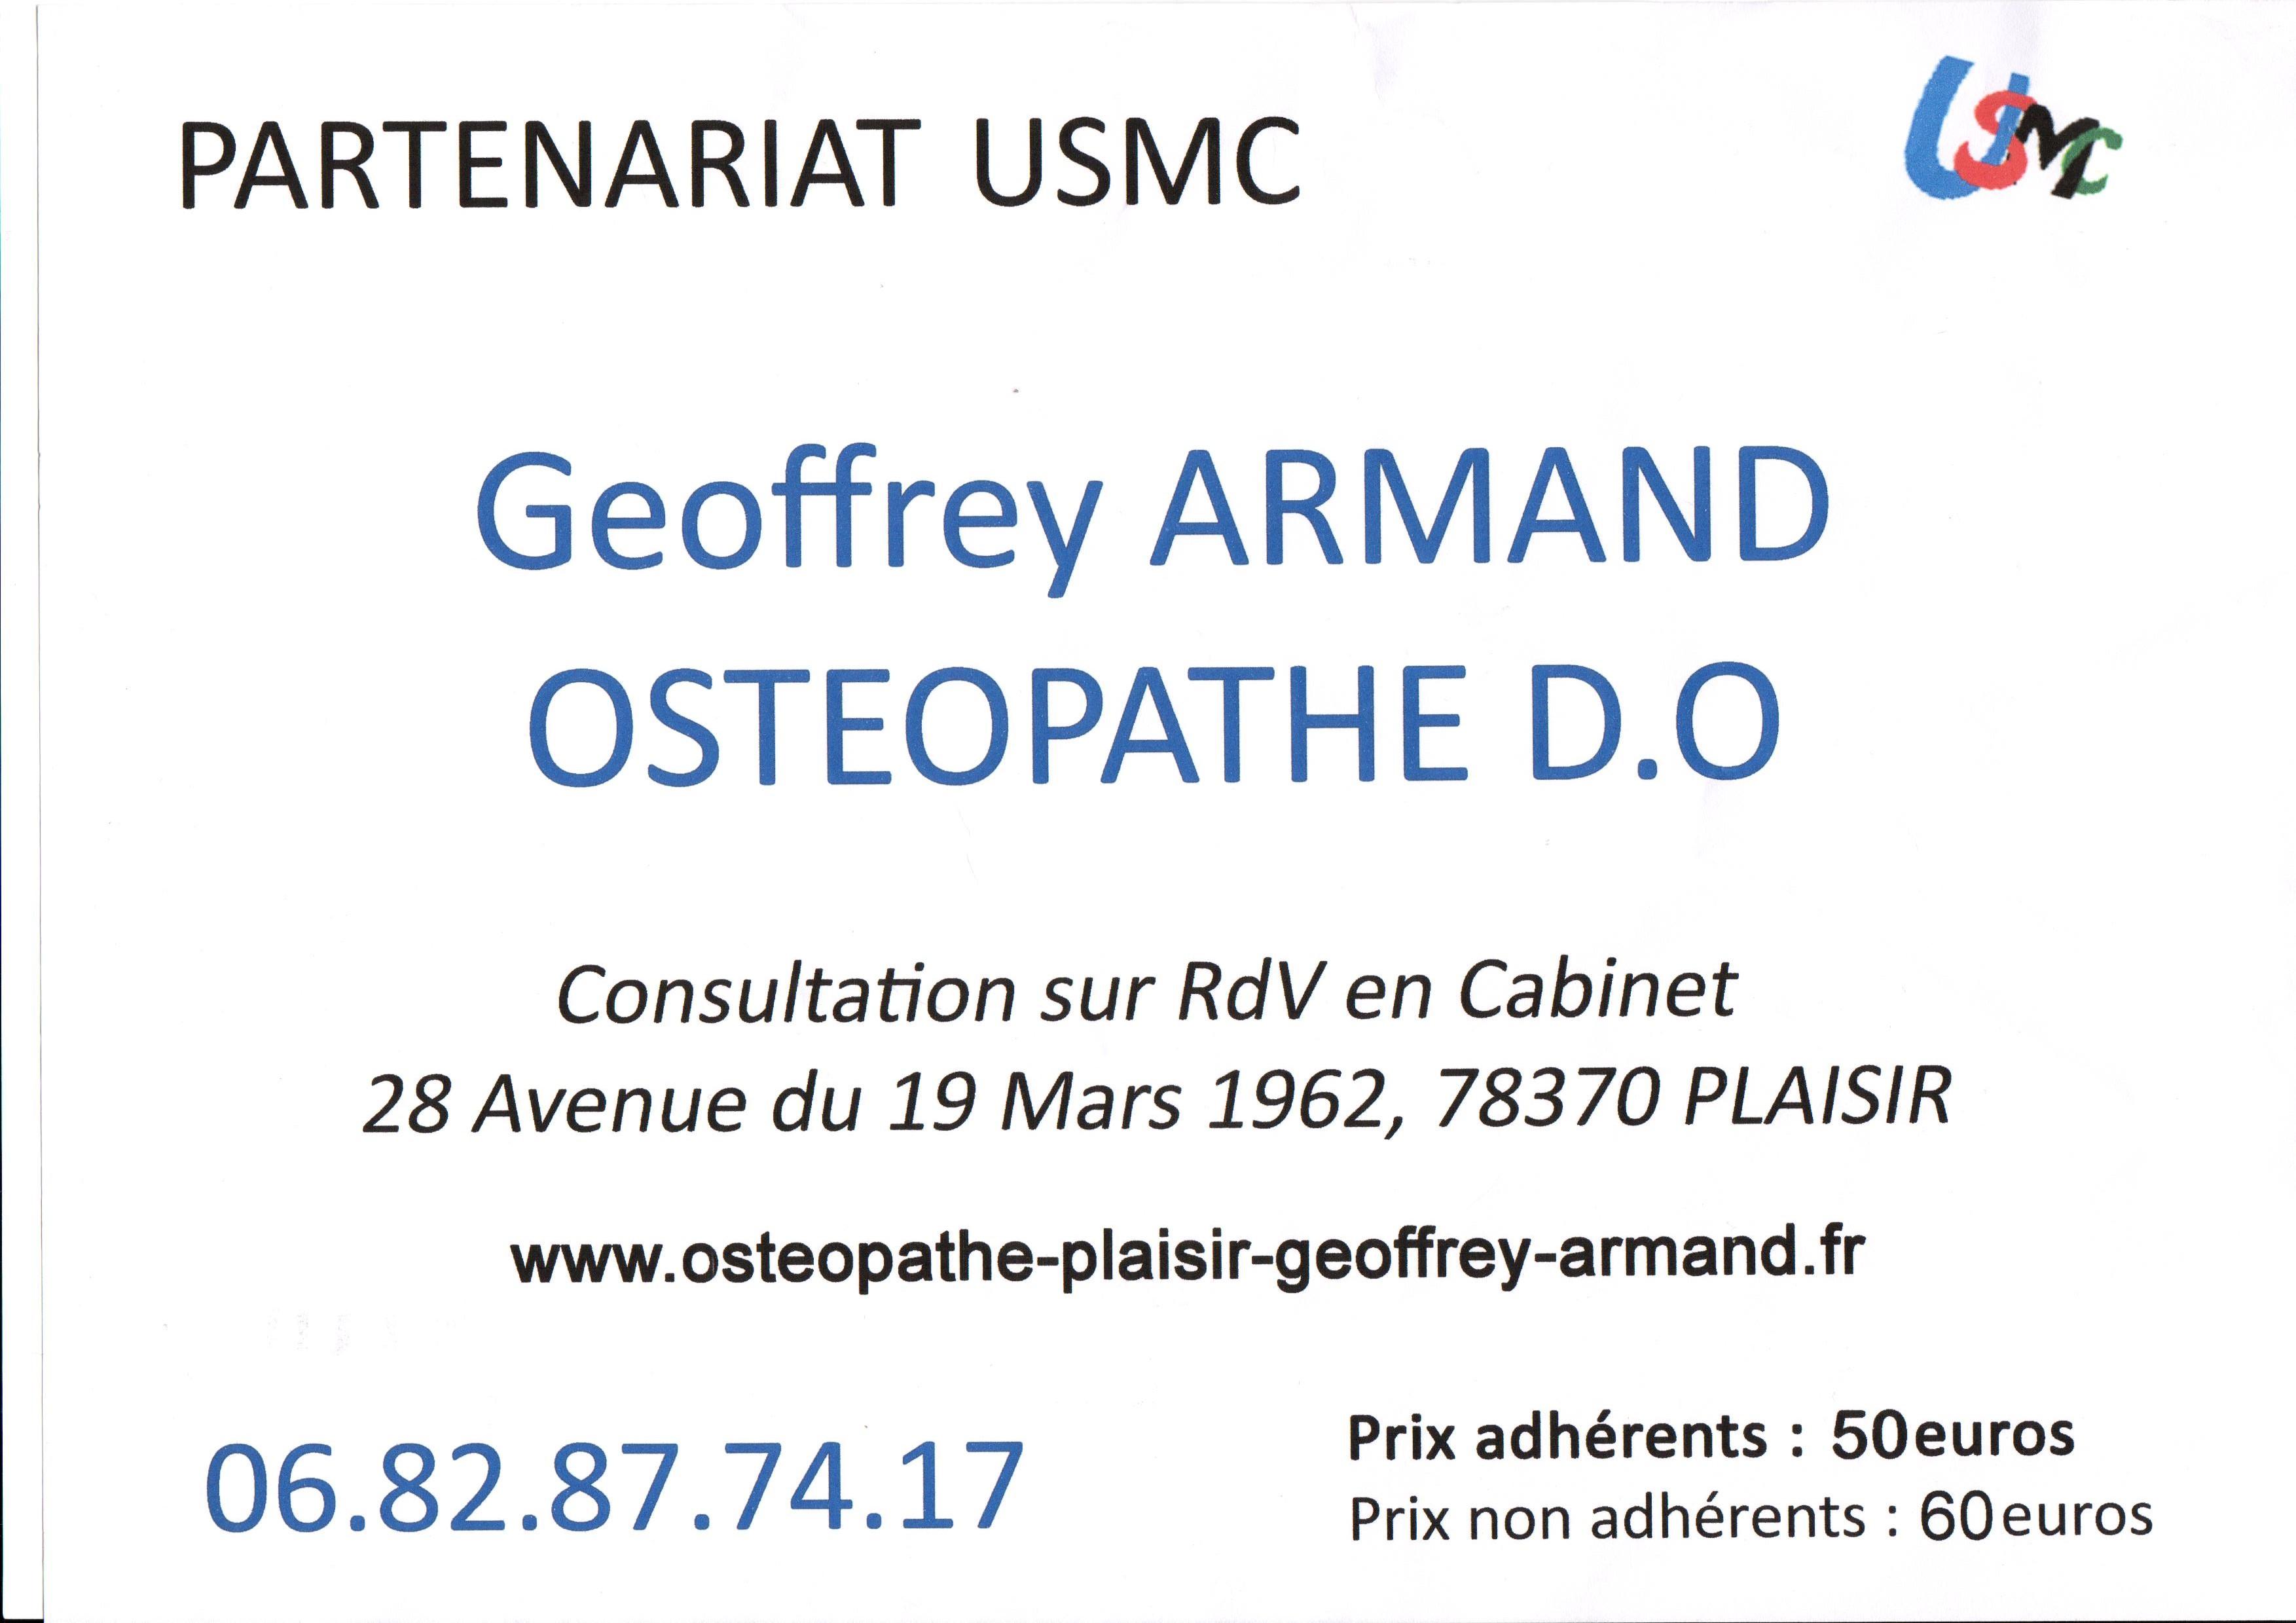 PARTENARIAT OSTEOPATHE